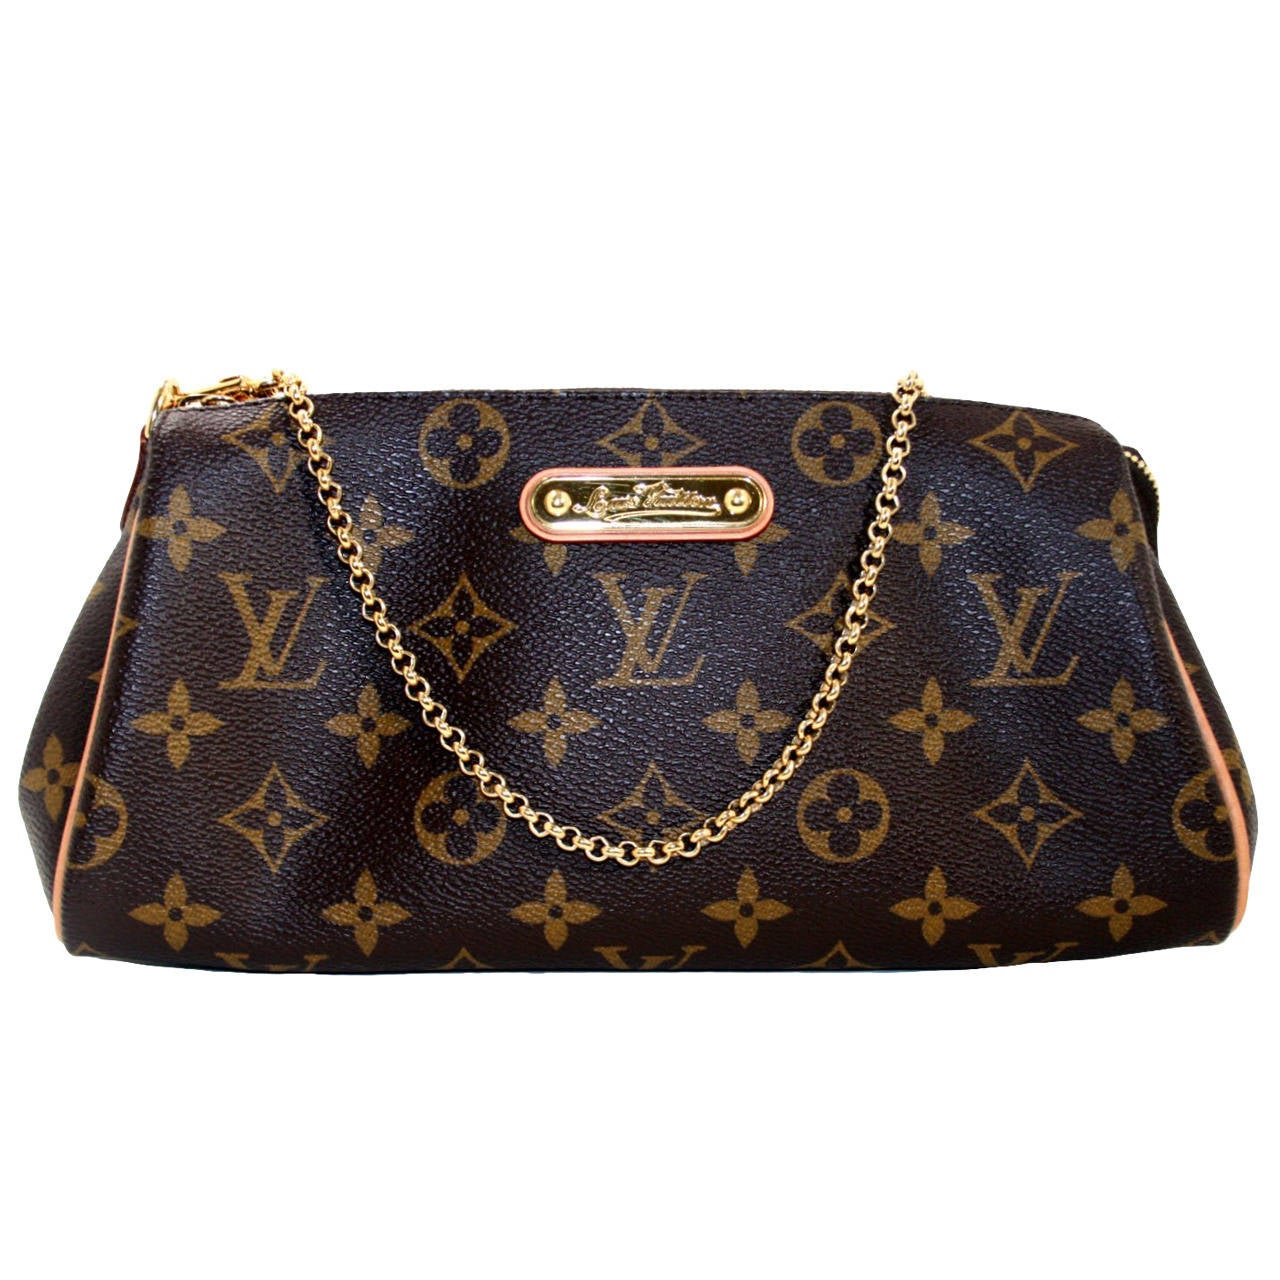 Louis Vuitton Monogram Eva Clutch Crossbody Bag at 1stdibs